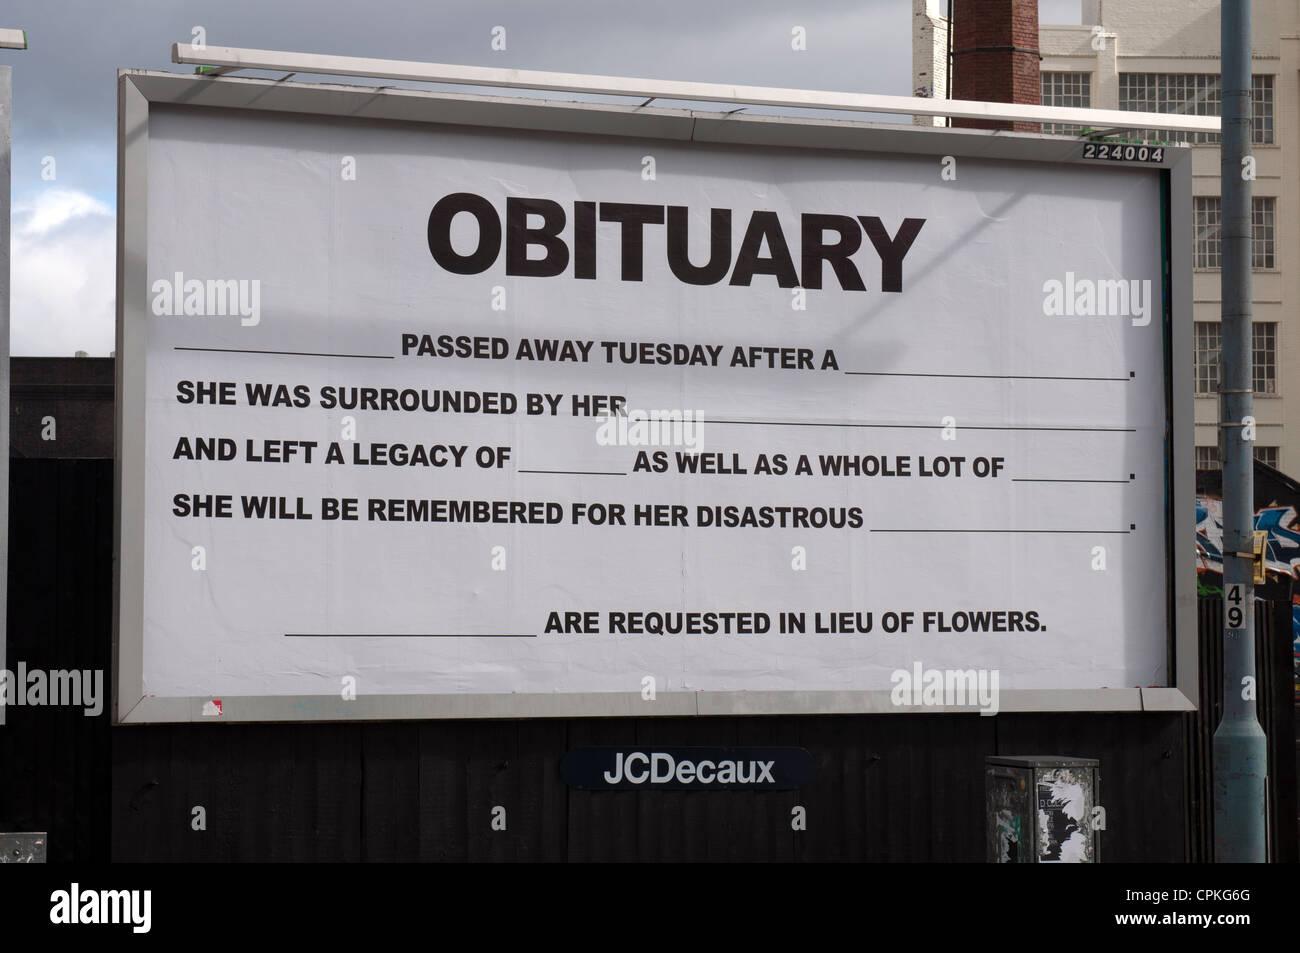 48 Sheet Billboard Project, Birmingham, UK - Stock Image